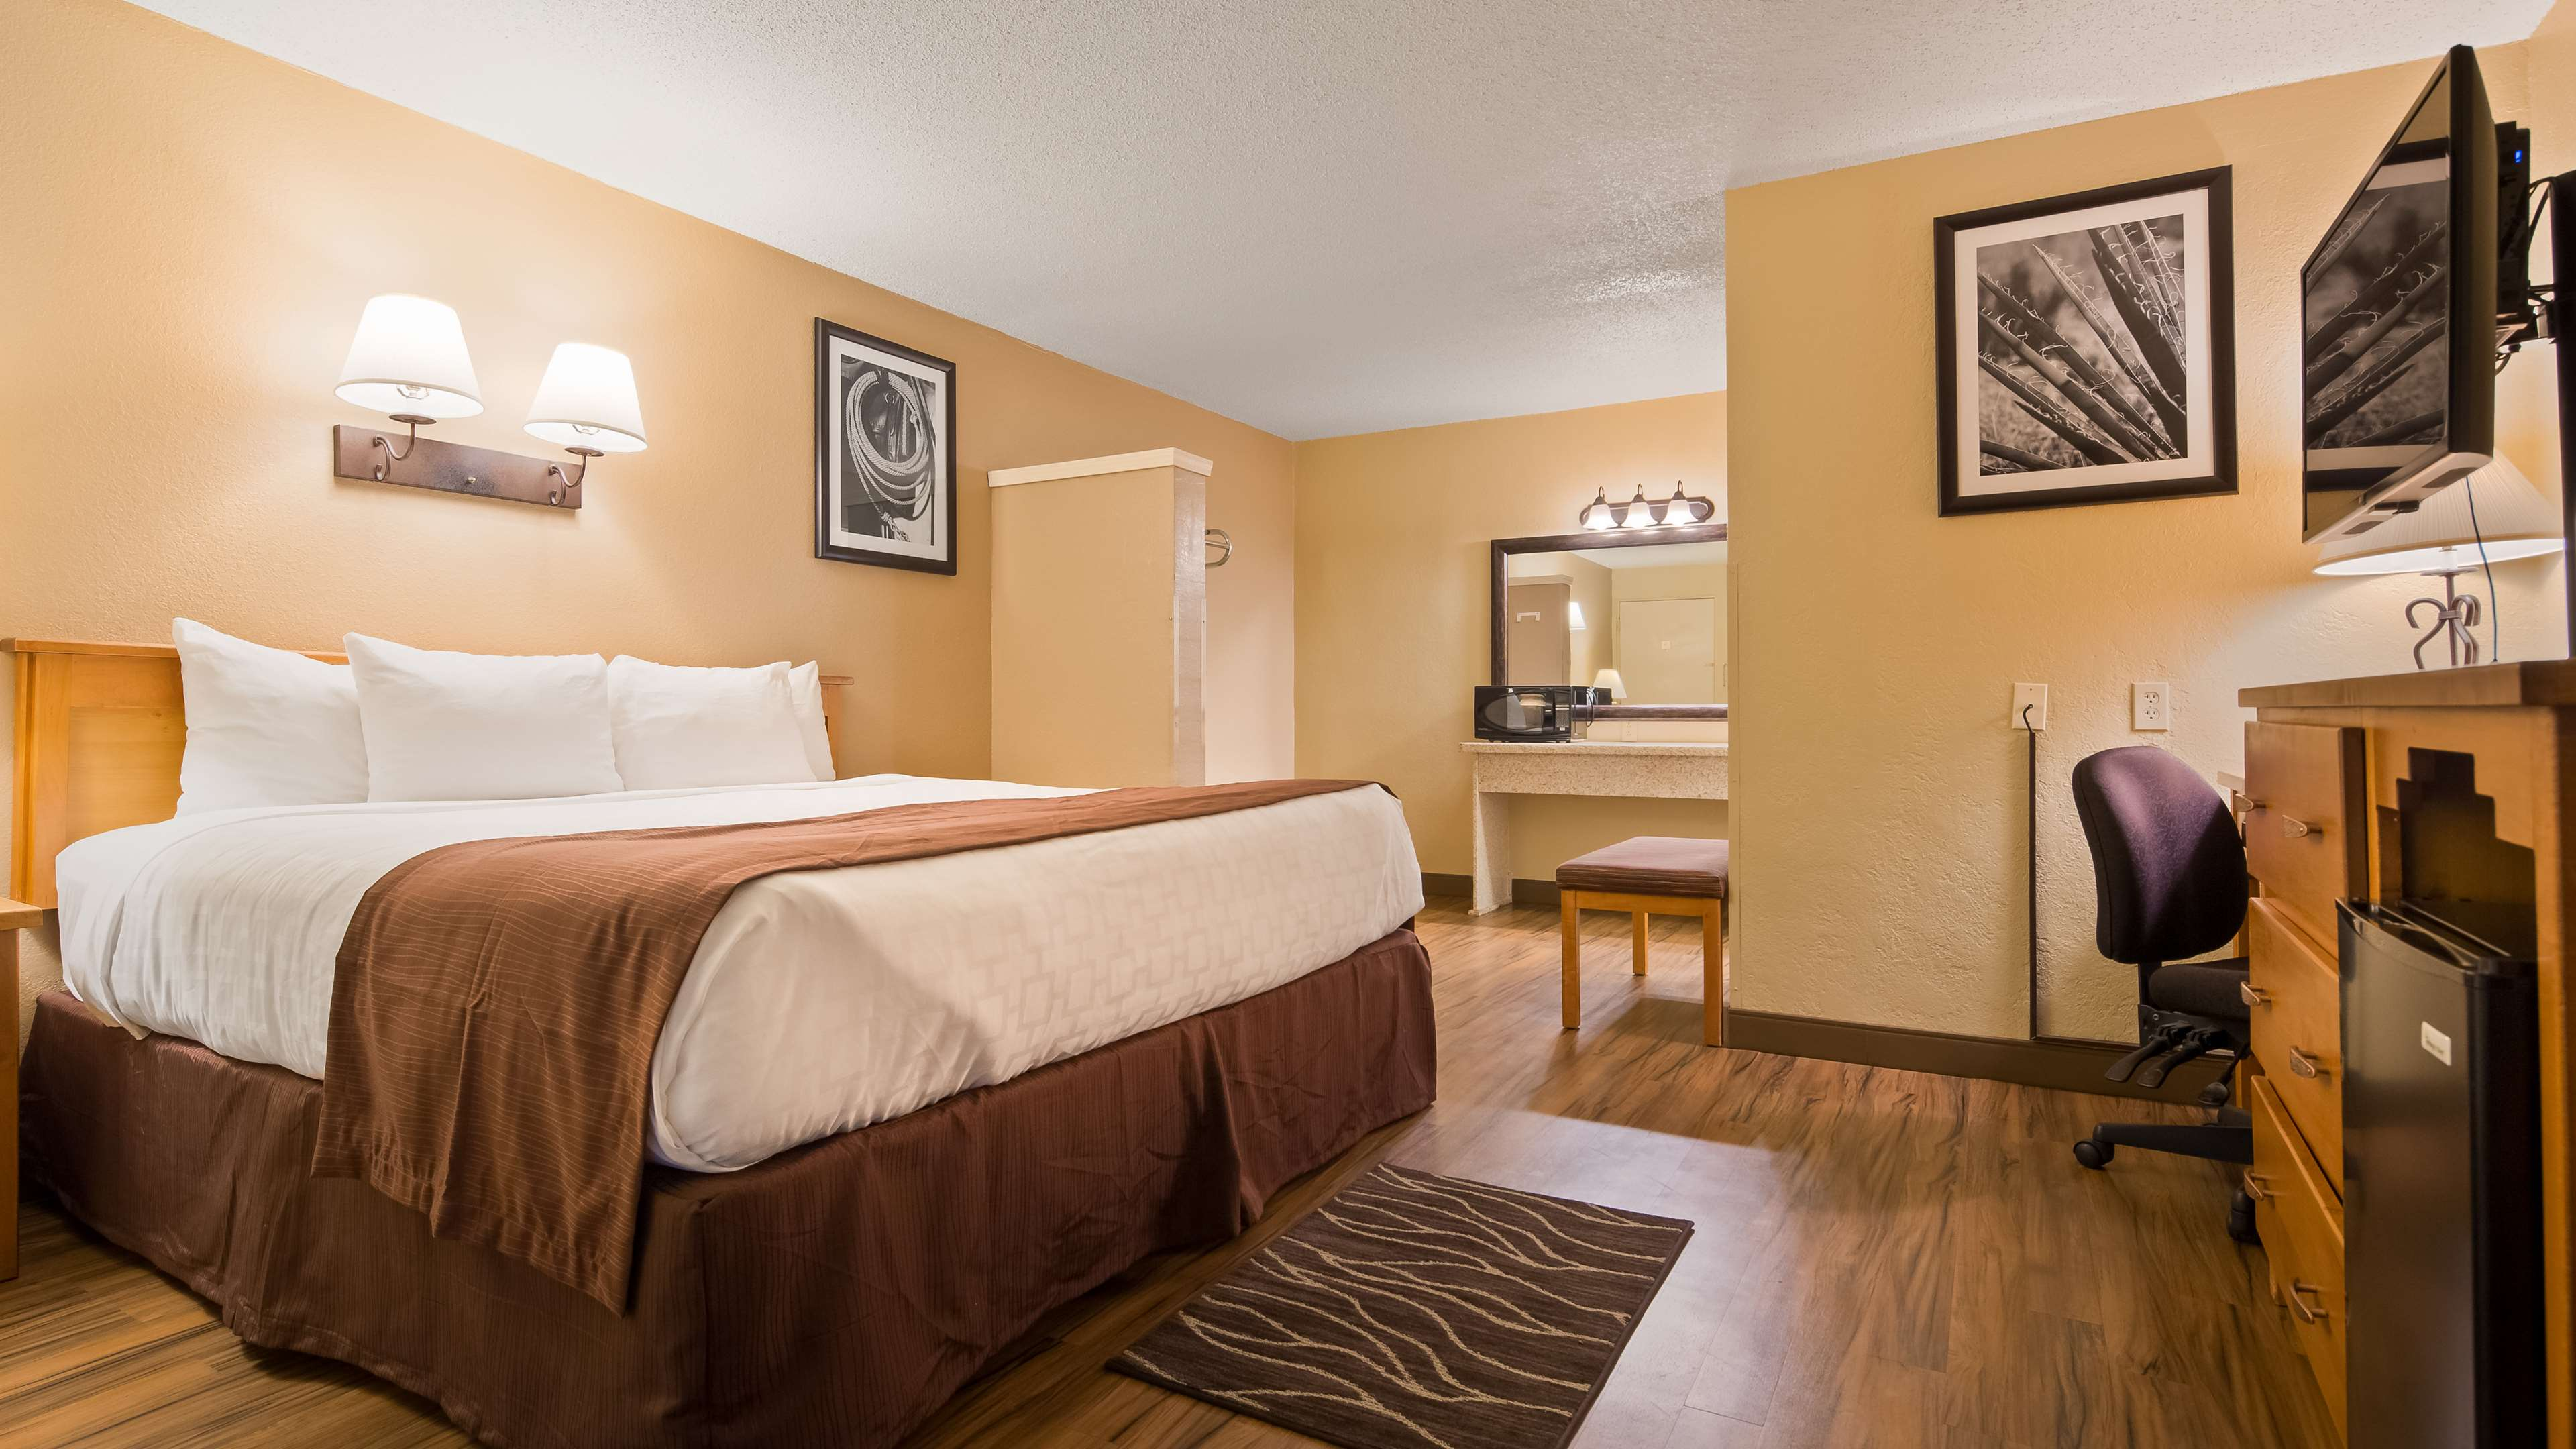 Best Western Turquoise Inn & Suites image 16